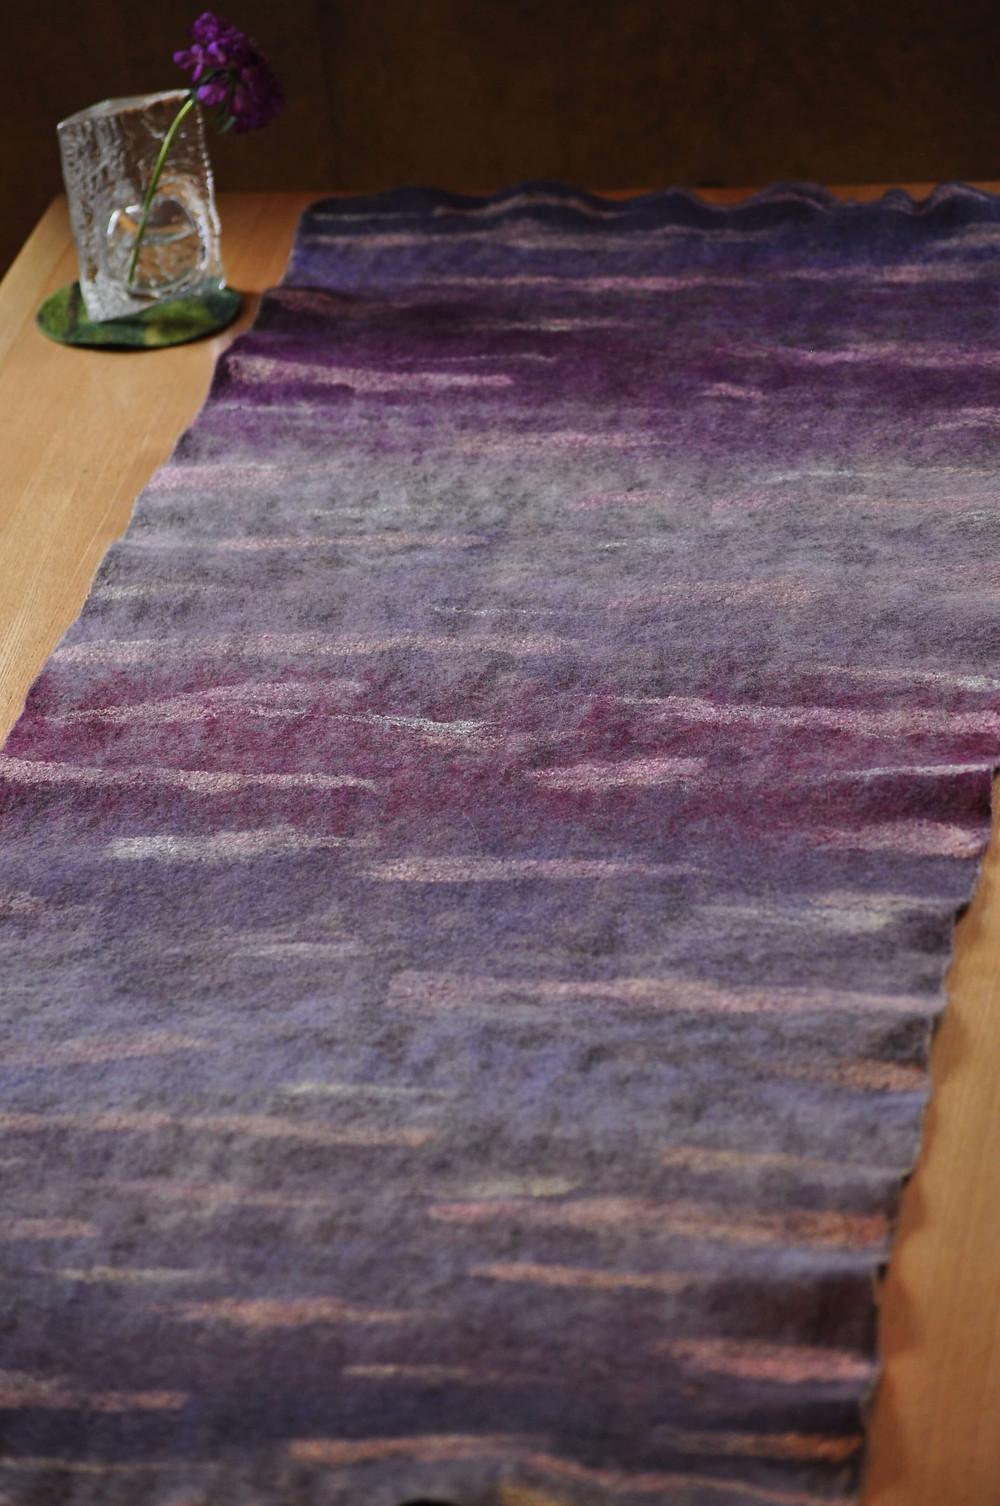 Chiholaine お着物に合うウールと絹の大判ストール 表